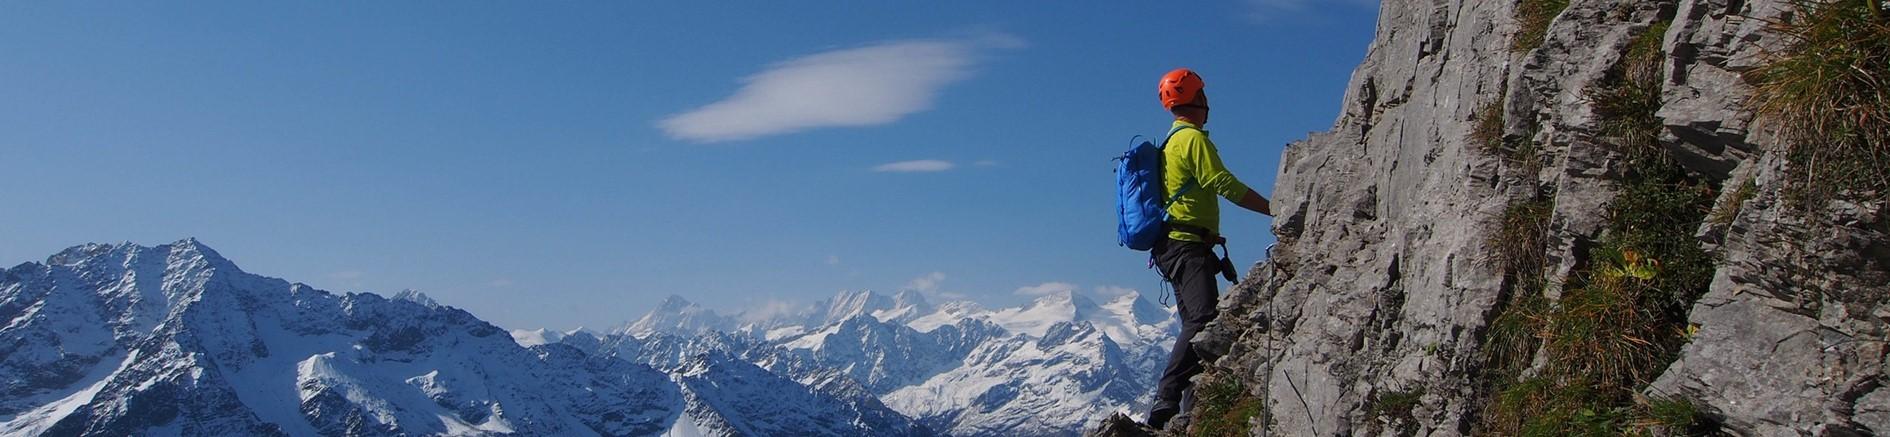 Klettersteig-Konfigurator